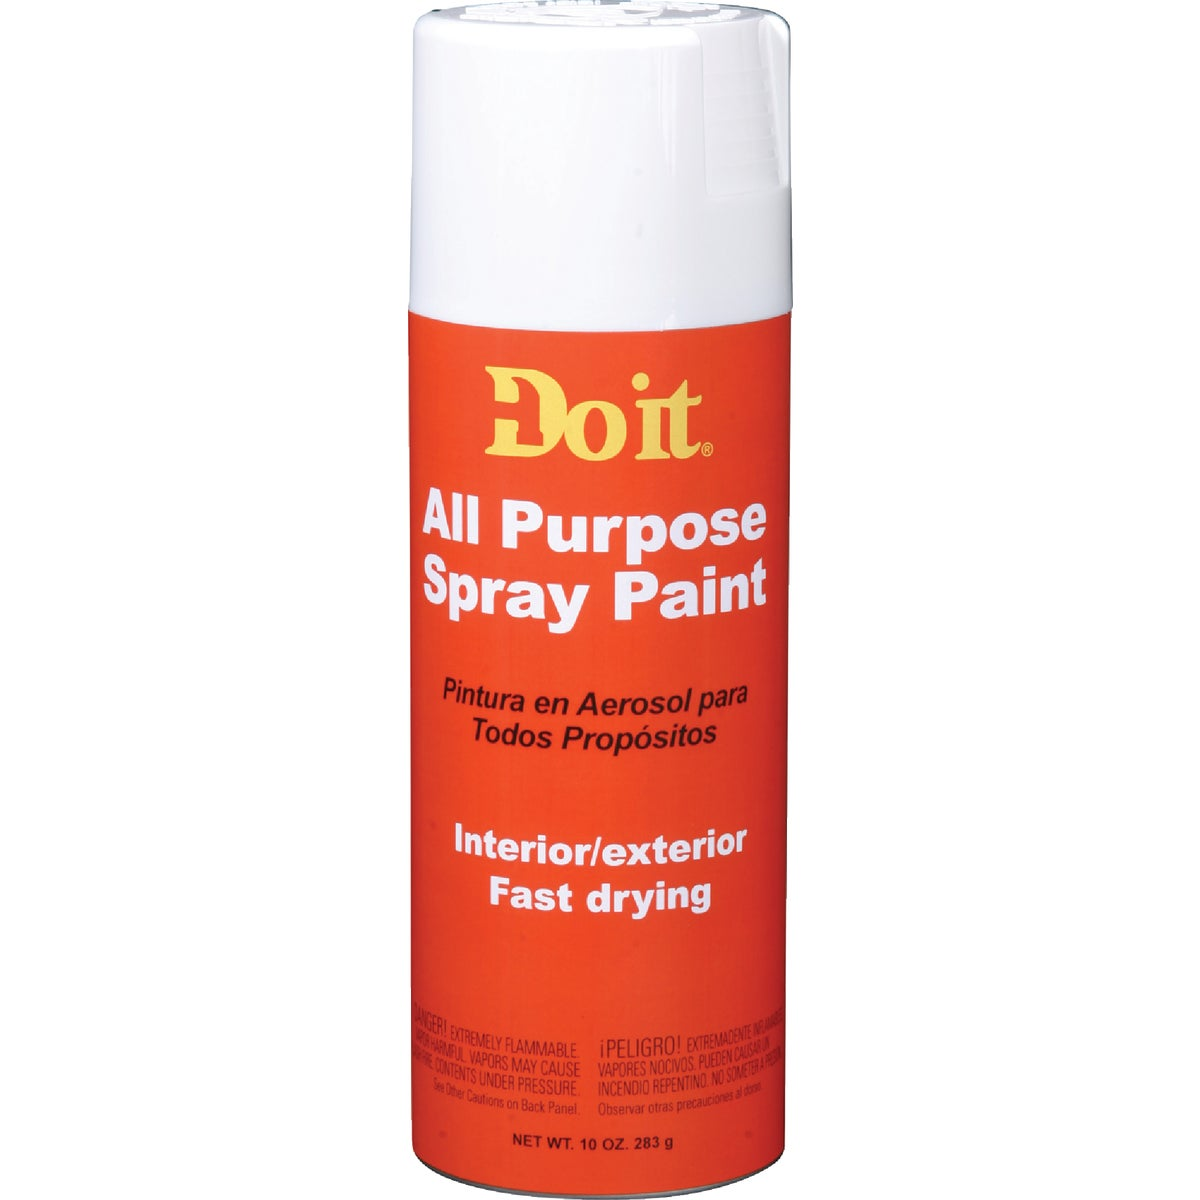 Do it All Purpose Spray Paint